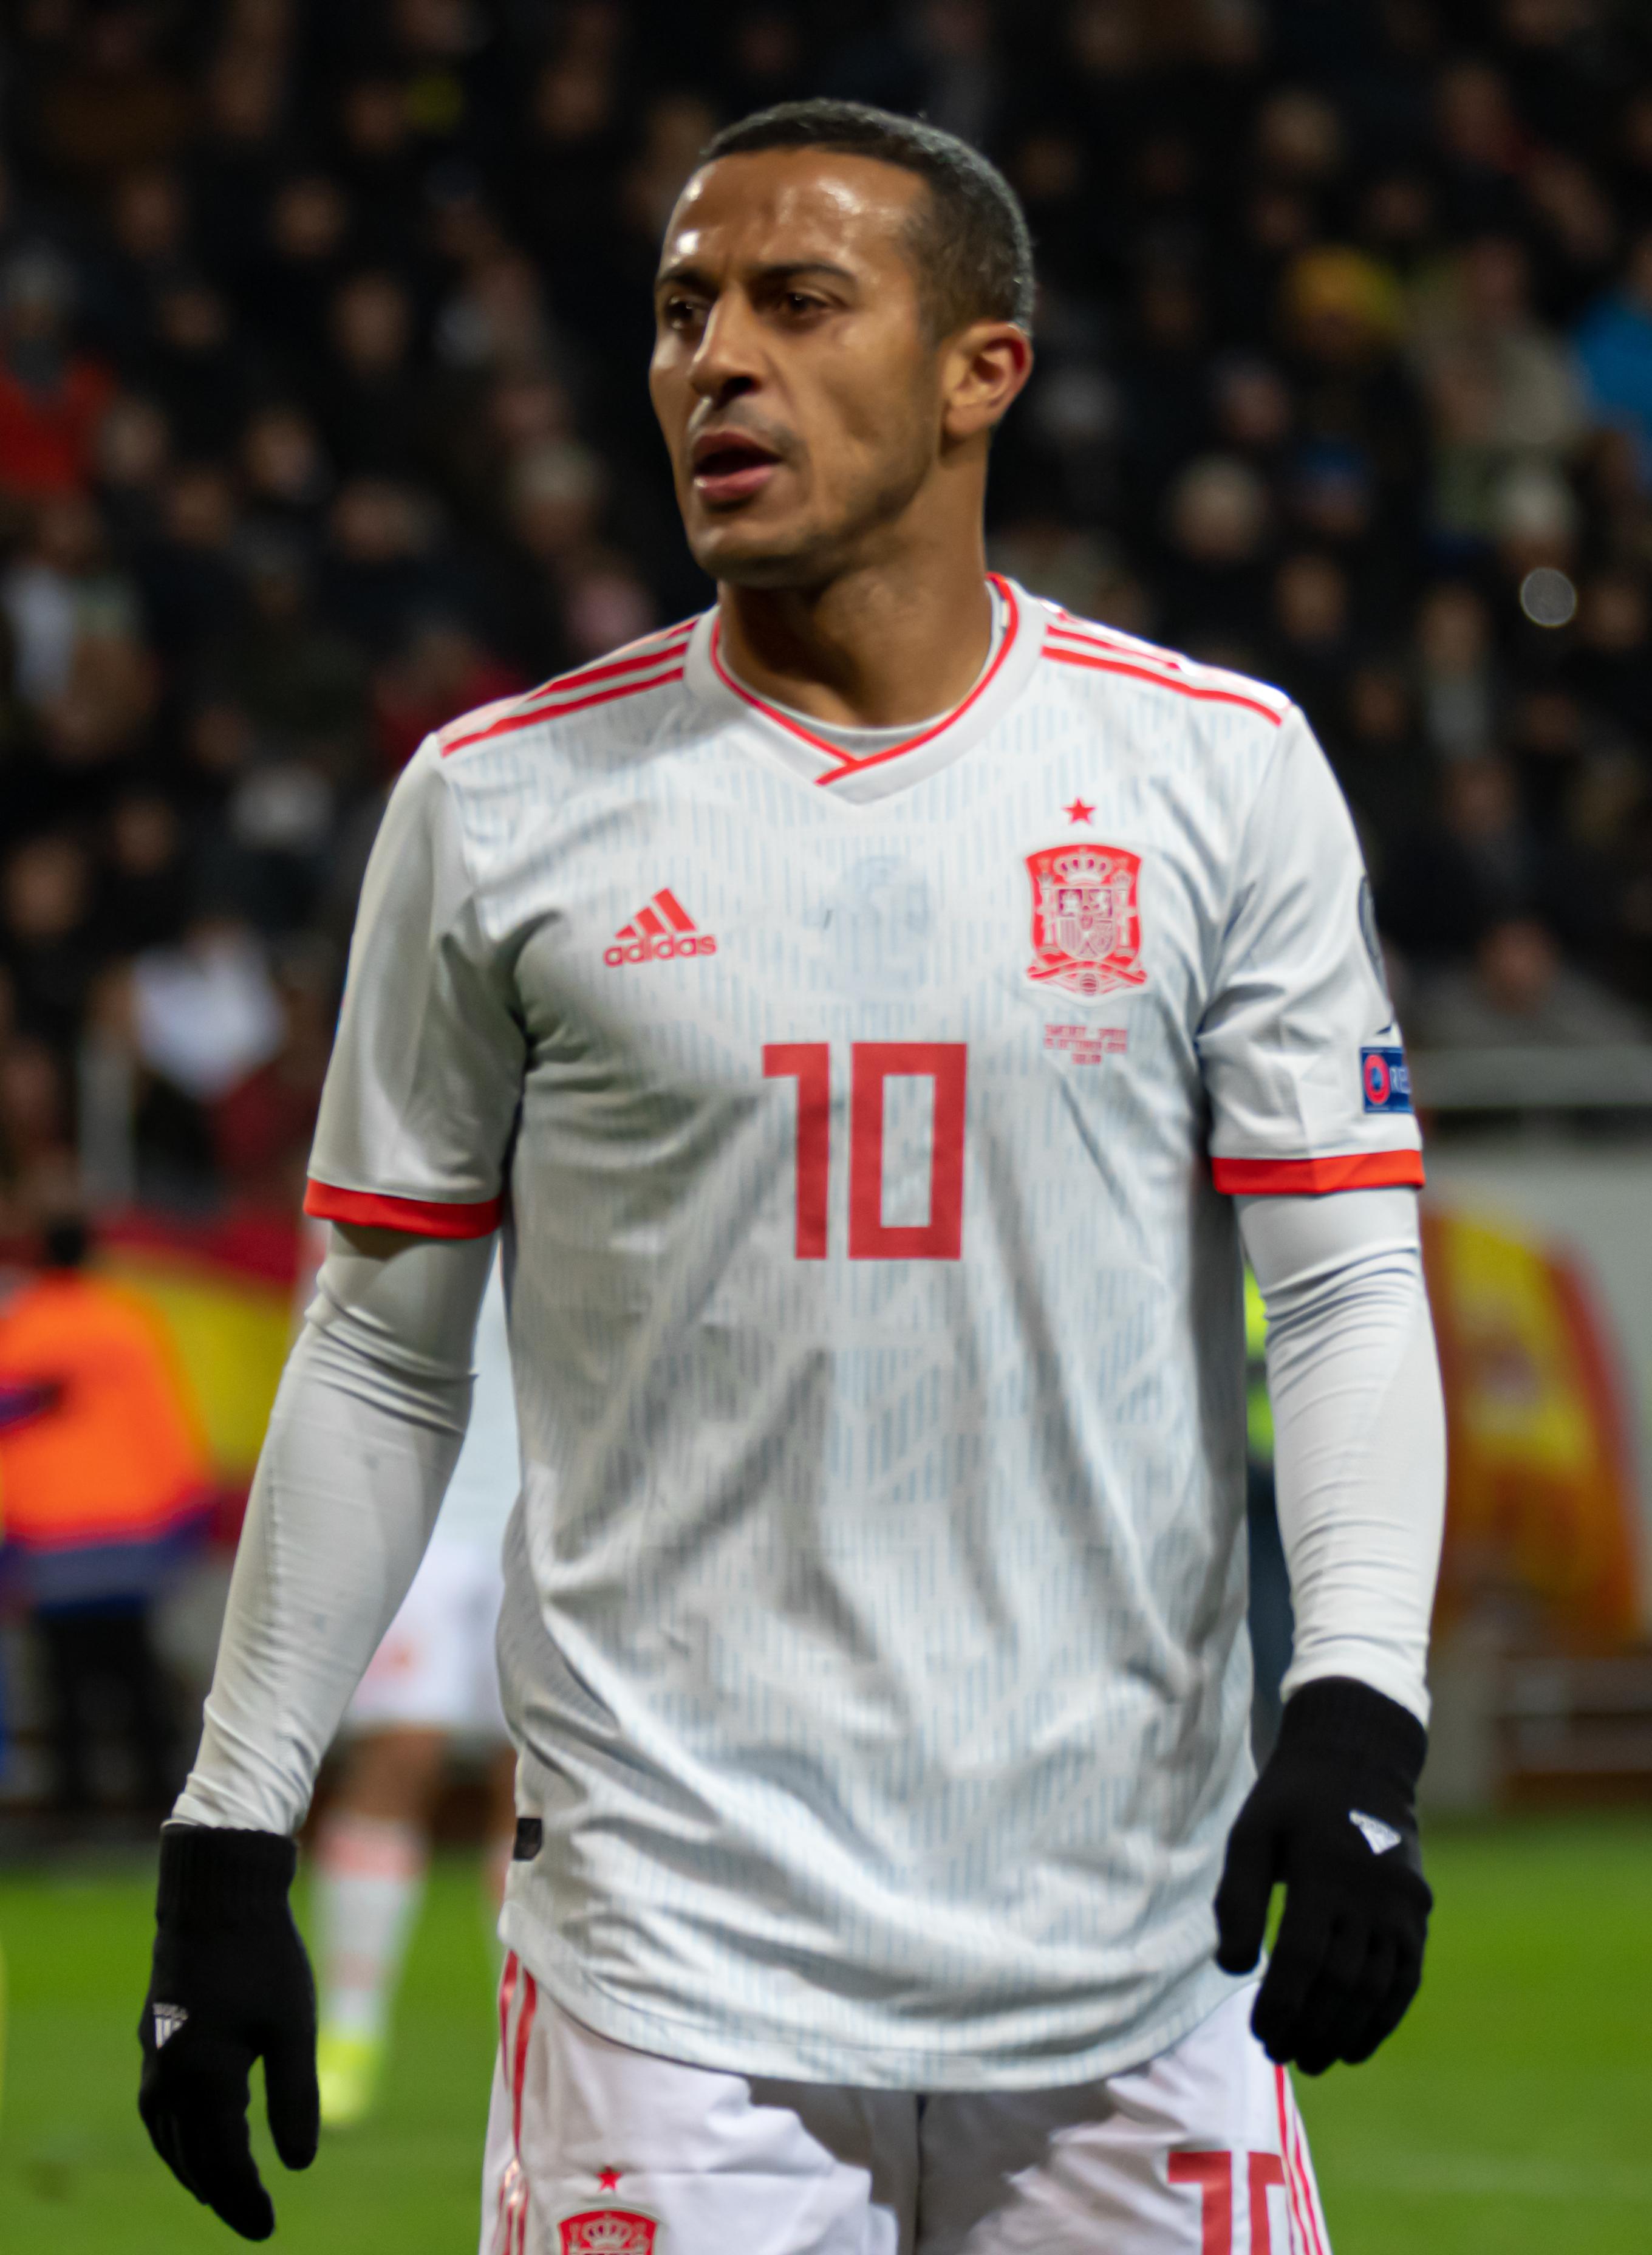 File:UEFA EURO qualifiers Sweden vs Spain 20191015 Thiago Alcantara 13  (cropped).jpg - Wikimedia Commons